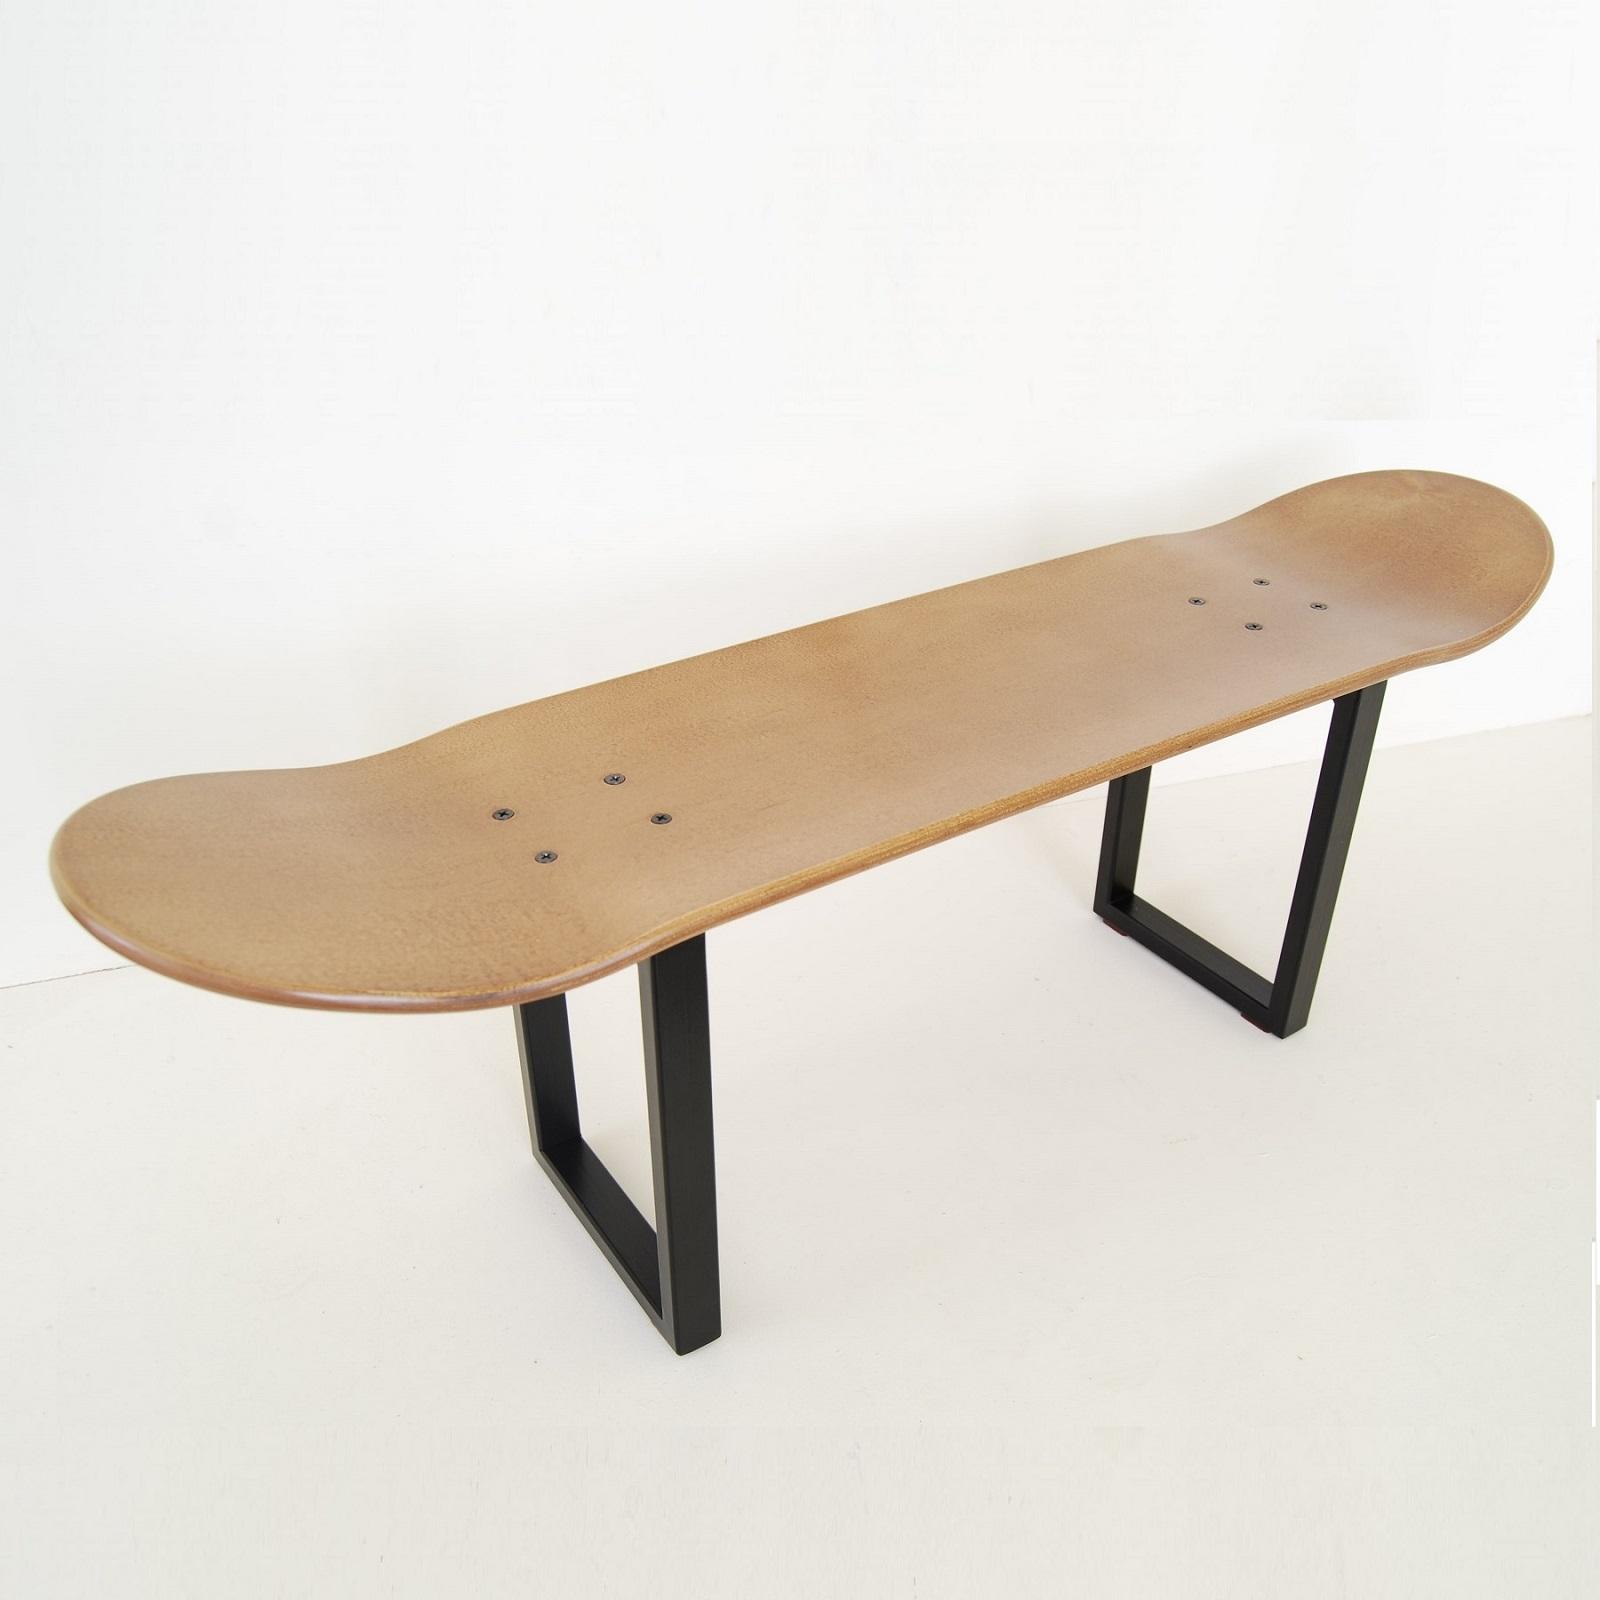 no comply skateboard avec pieds du tabouret en m tal et planche skate bois clair skate home. Black Bedroom Furniture Sets. Home Design Ideas